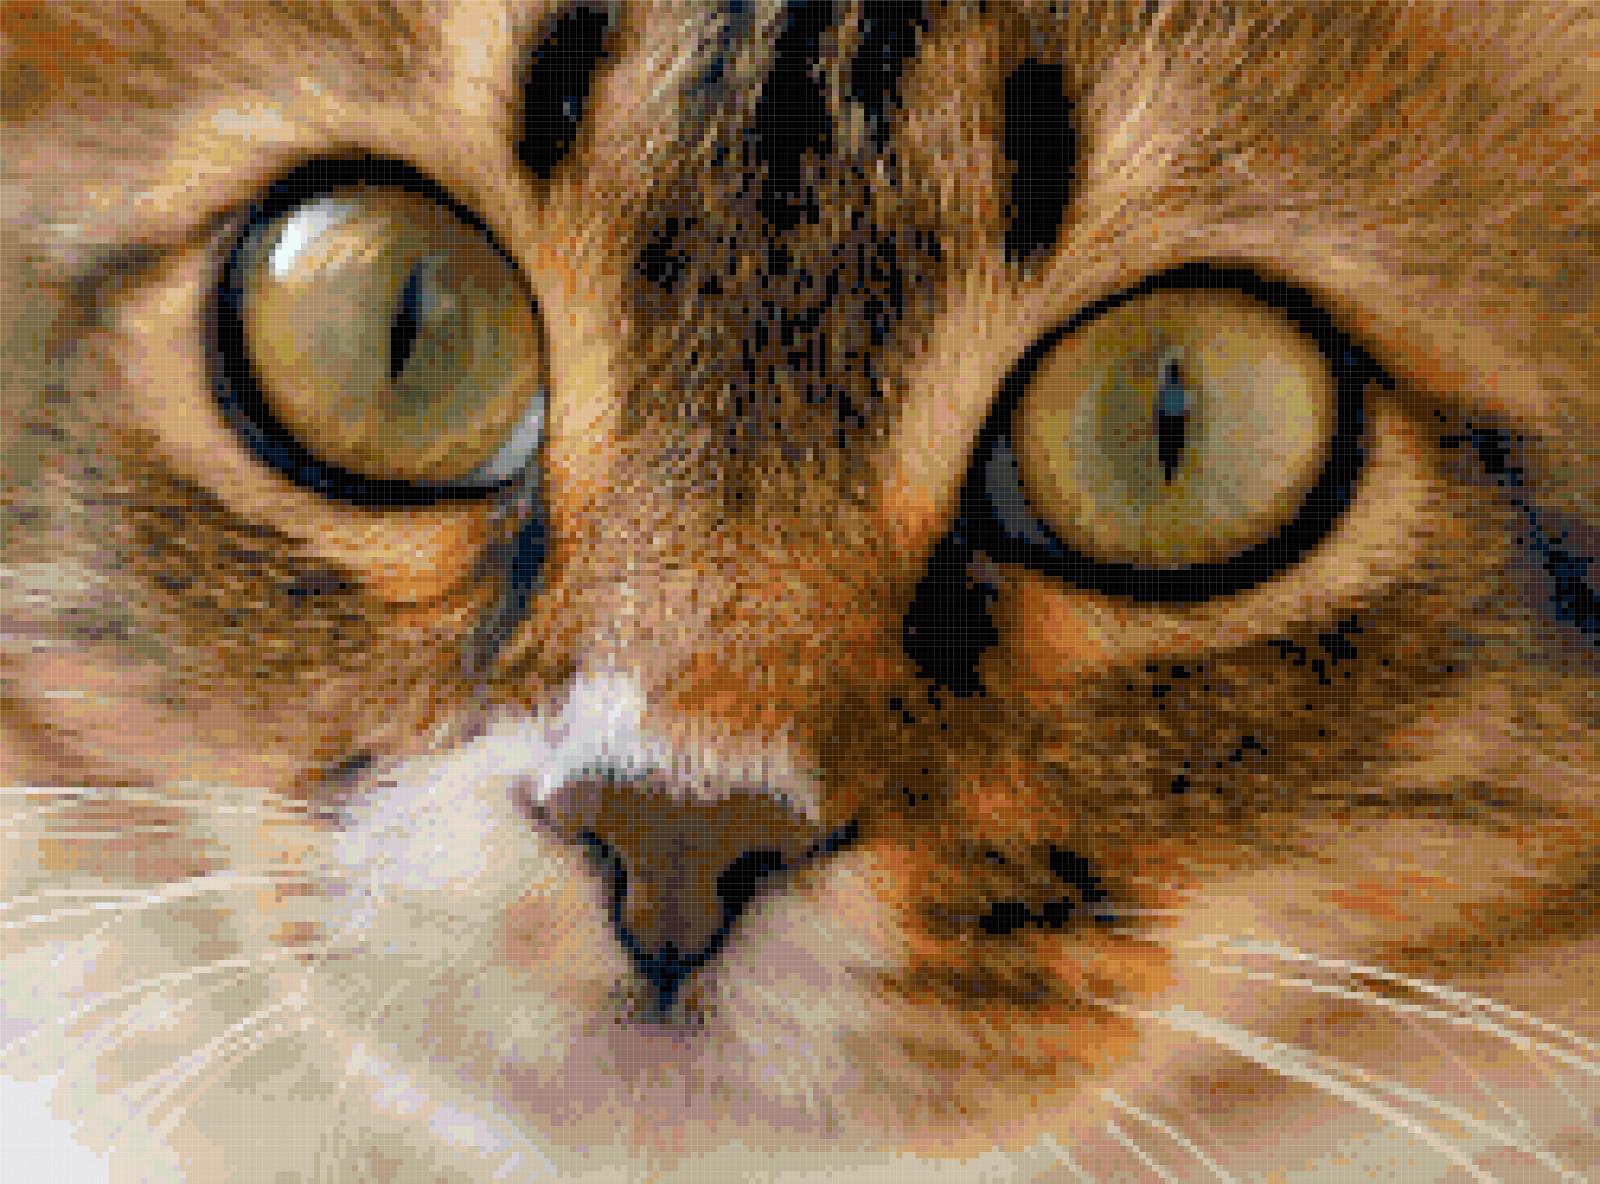 kitten cross stitch image